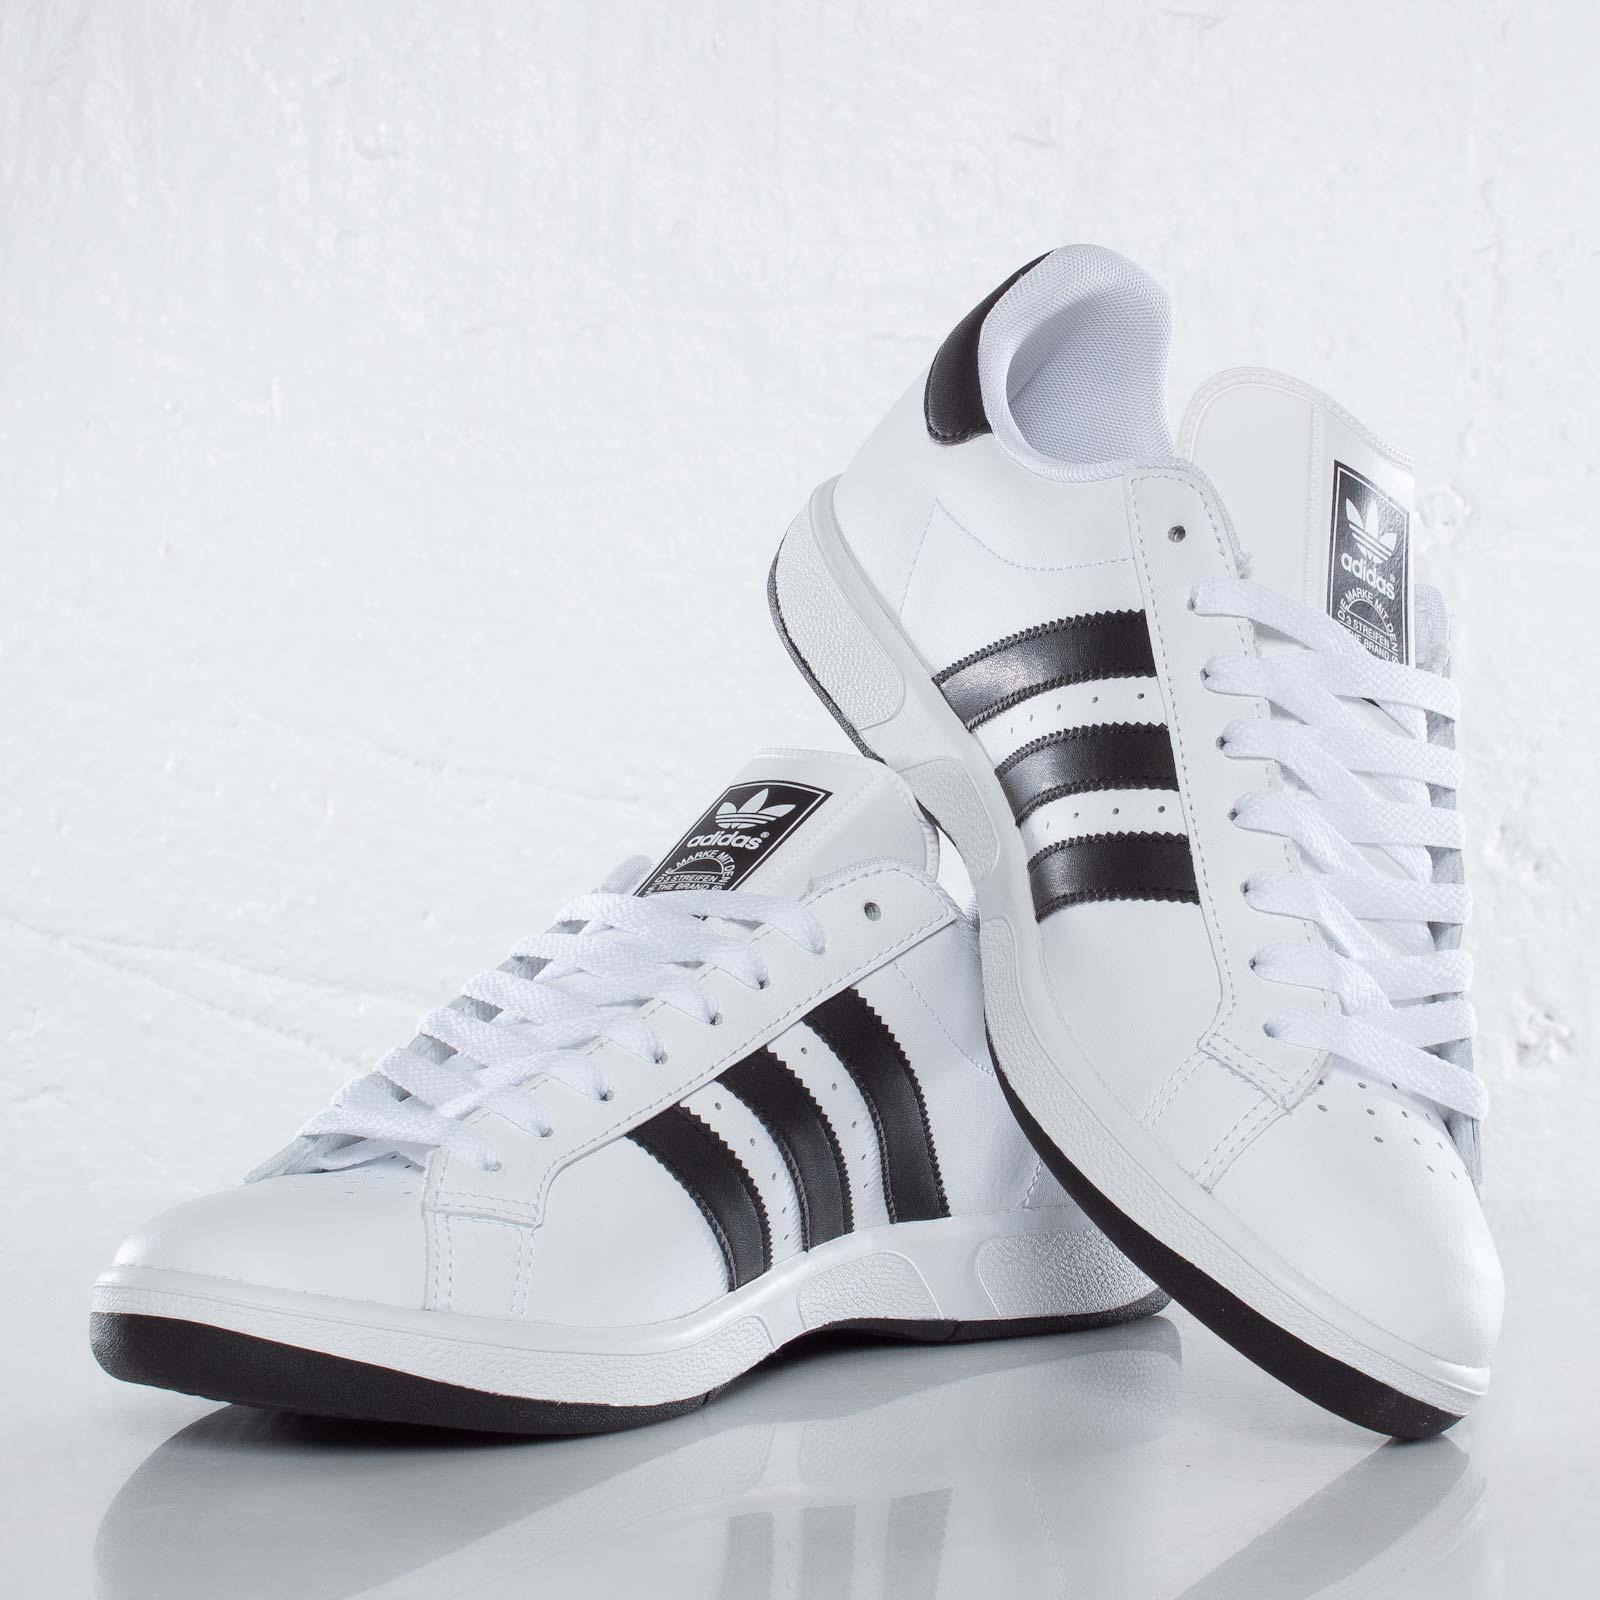 online store 08902 59d86 ... adidas Grand Prix